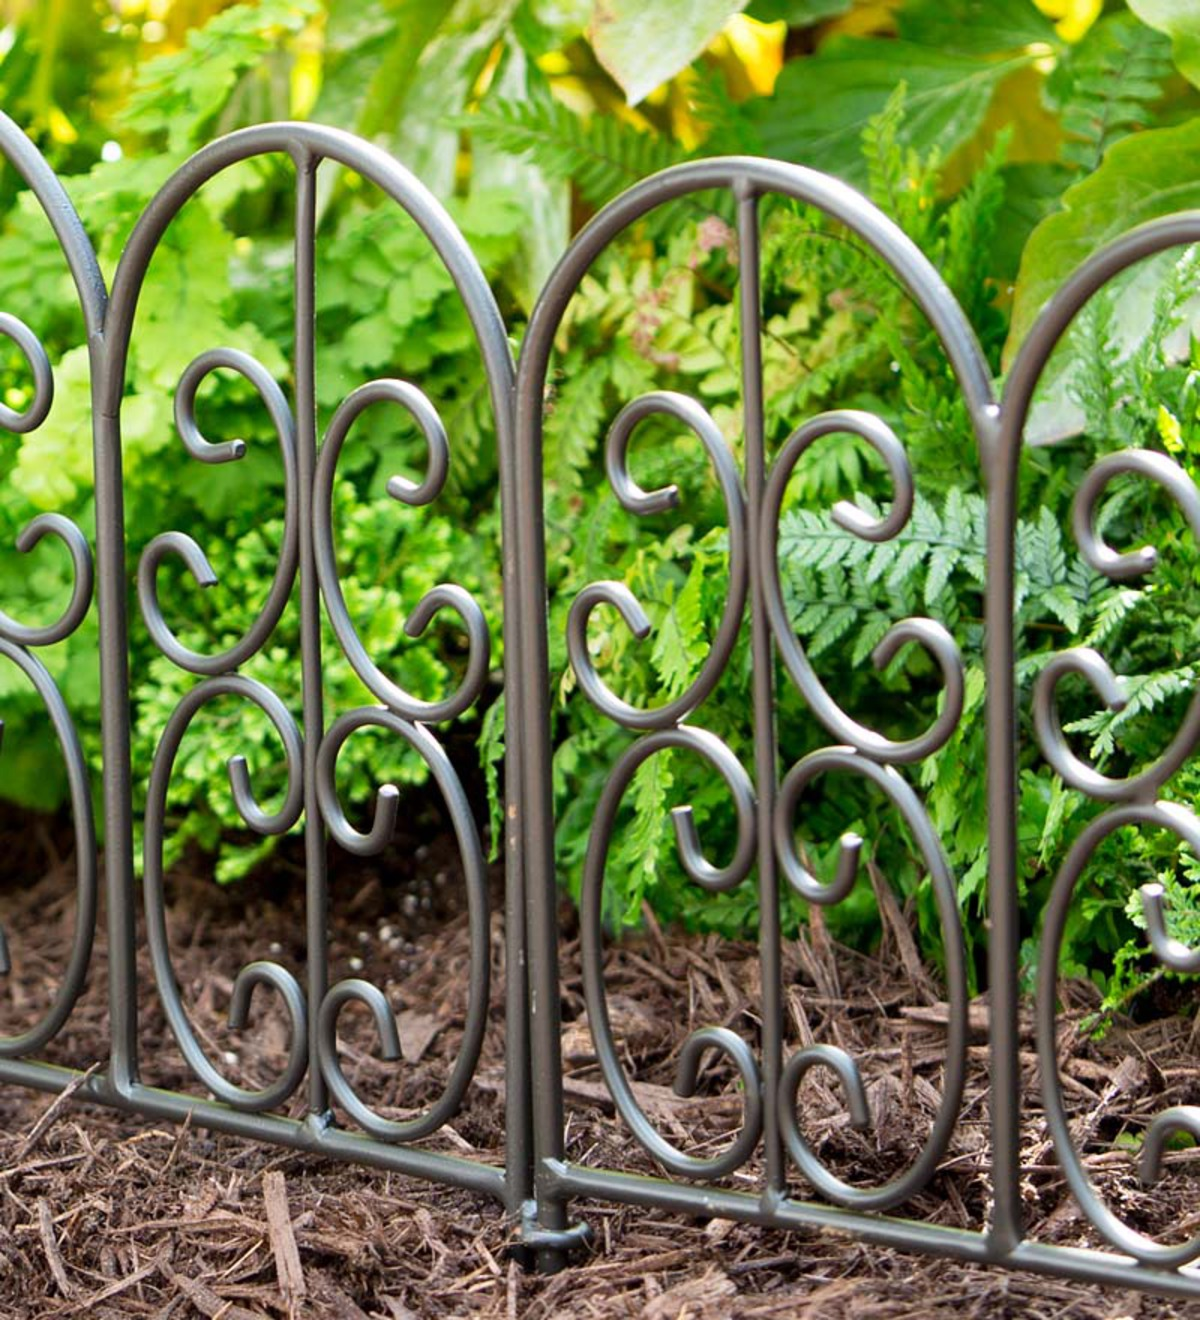 Wrought garden edging